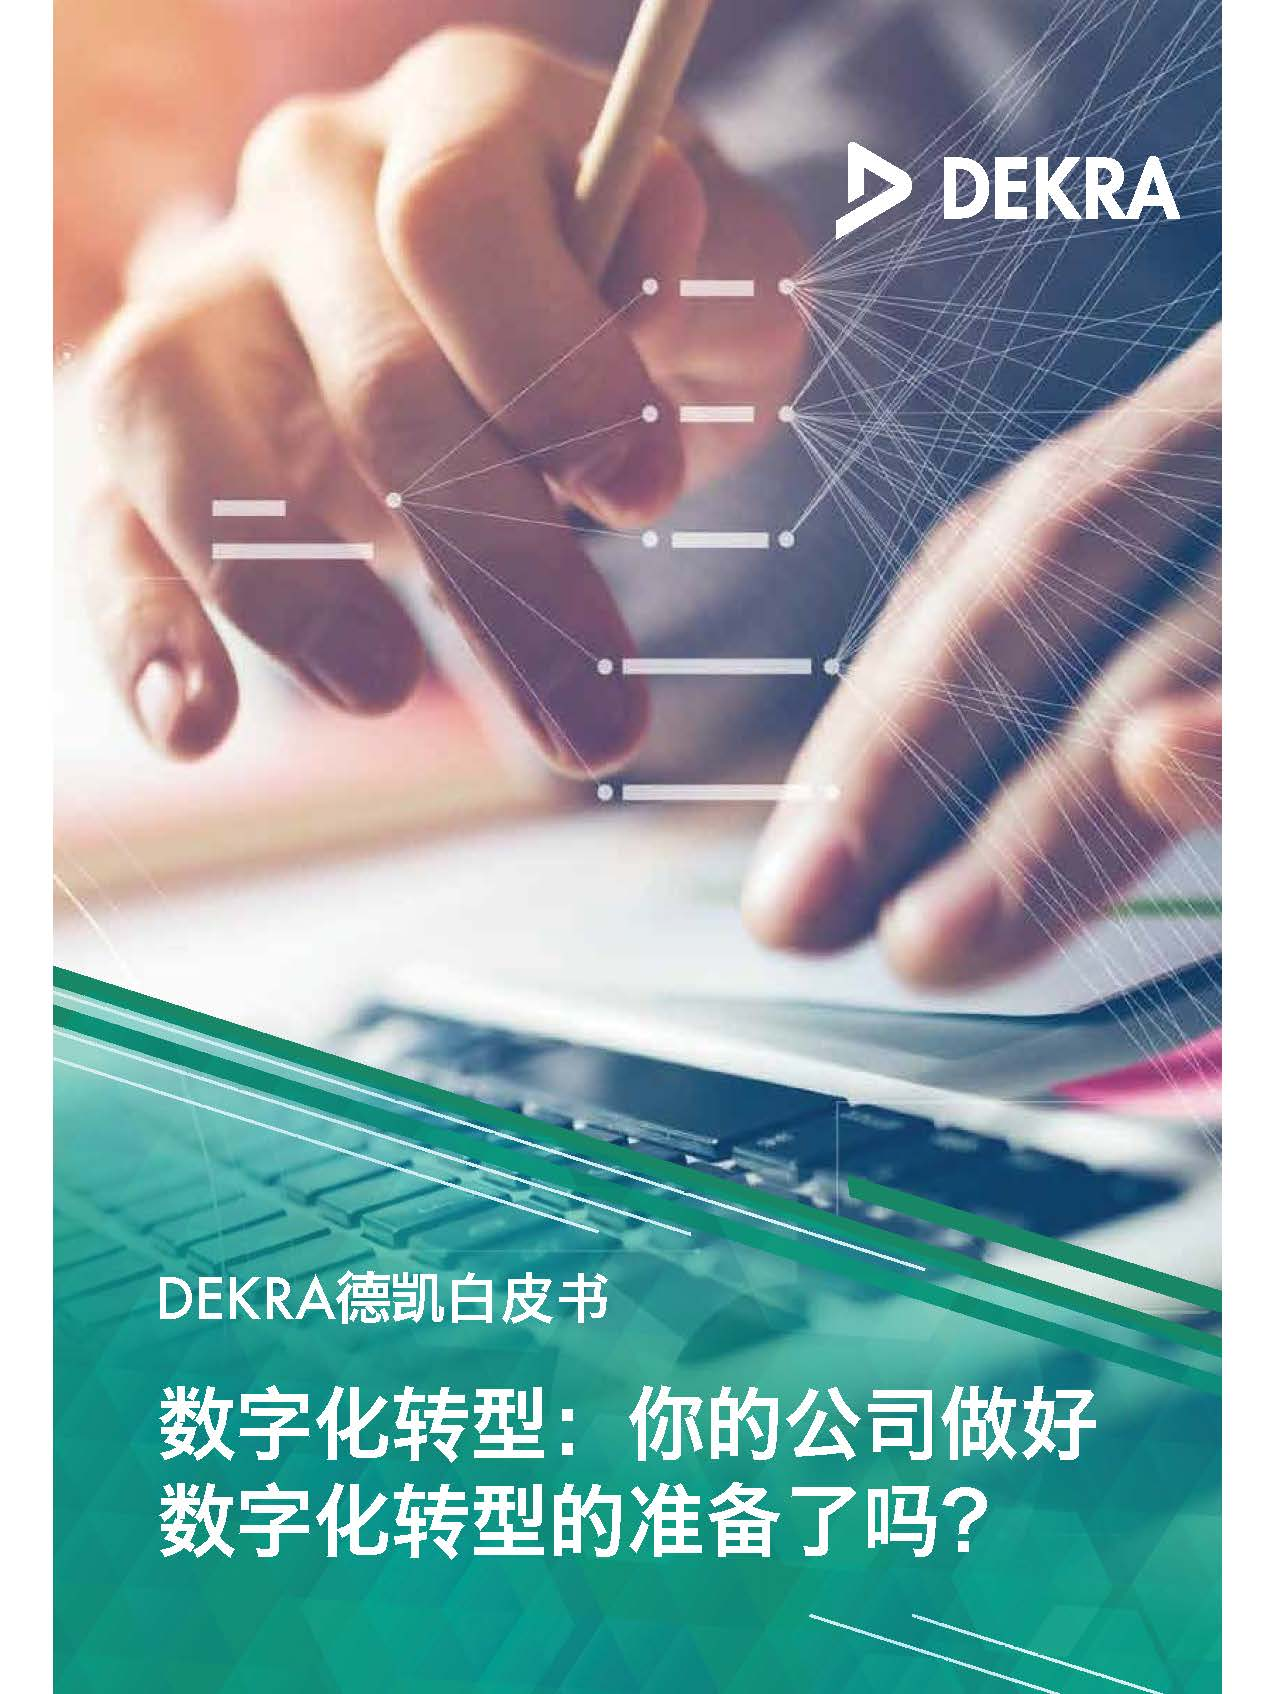 Dekra白皮书数字化转型 20210203.jpg